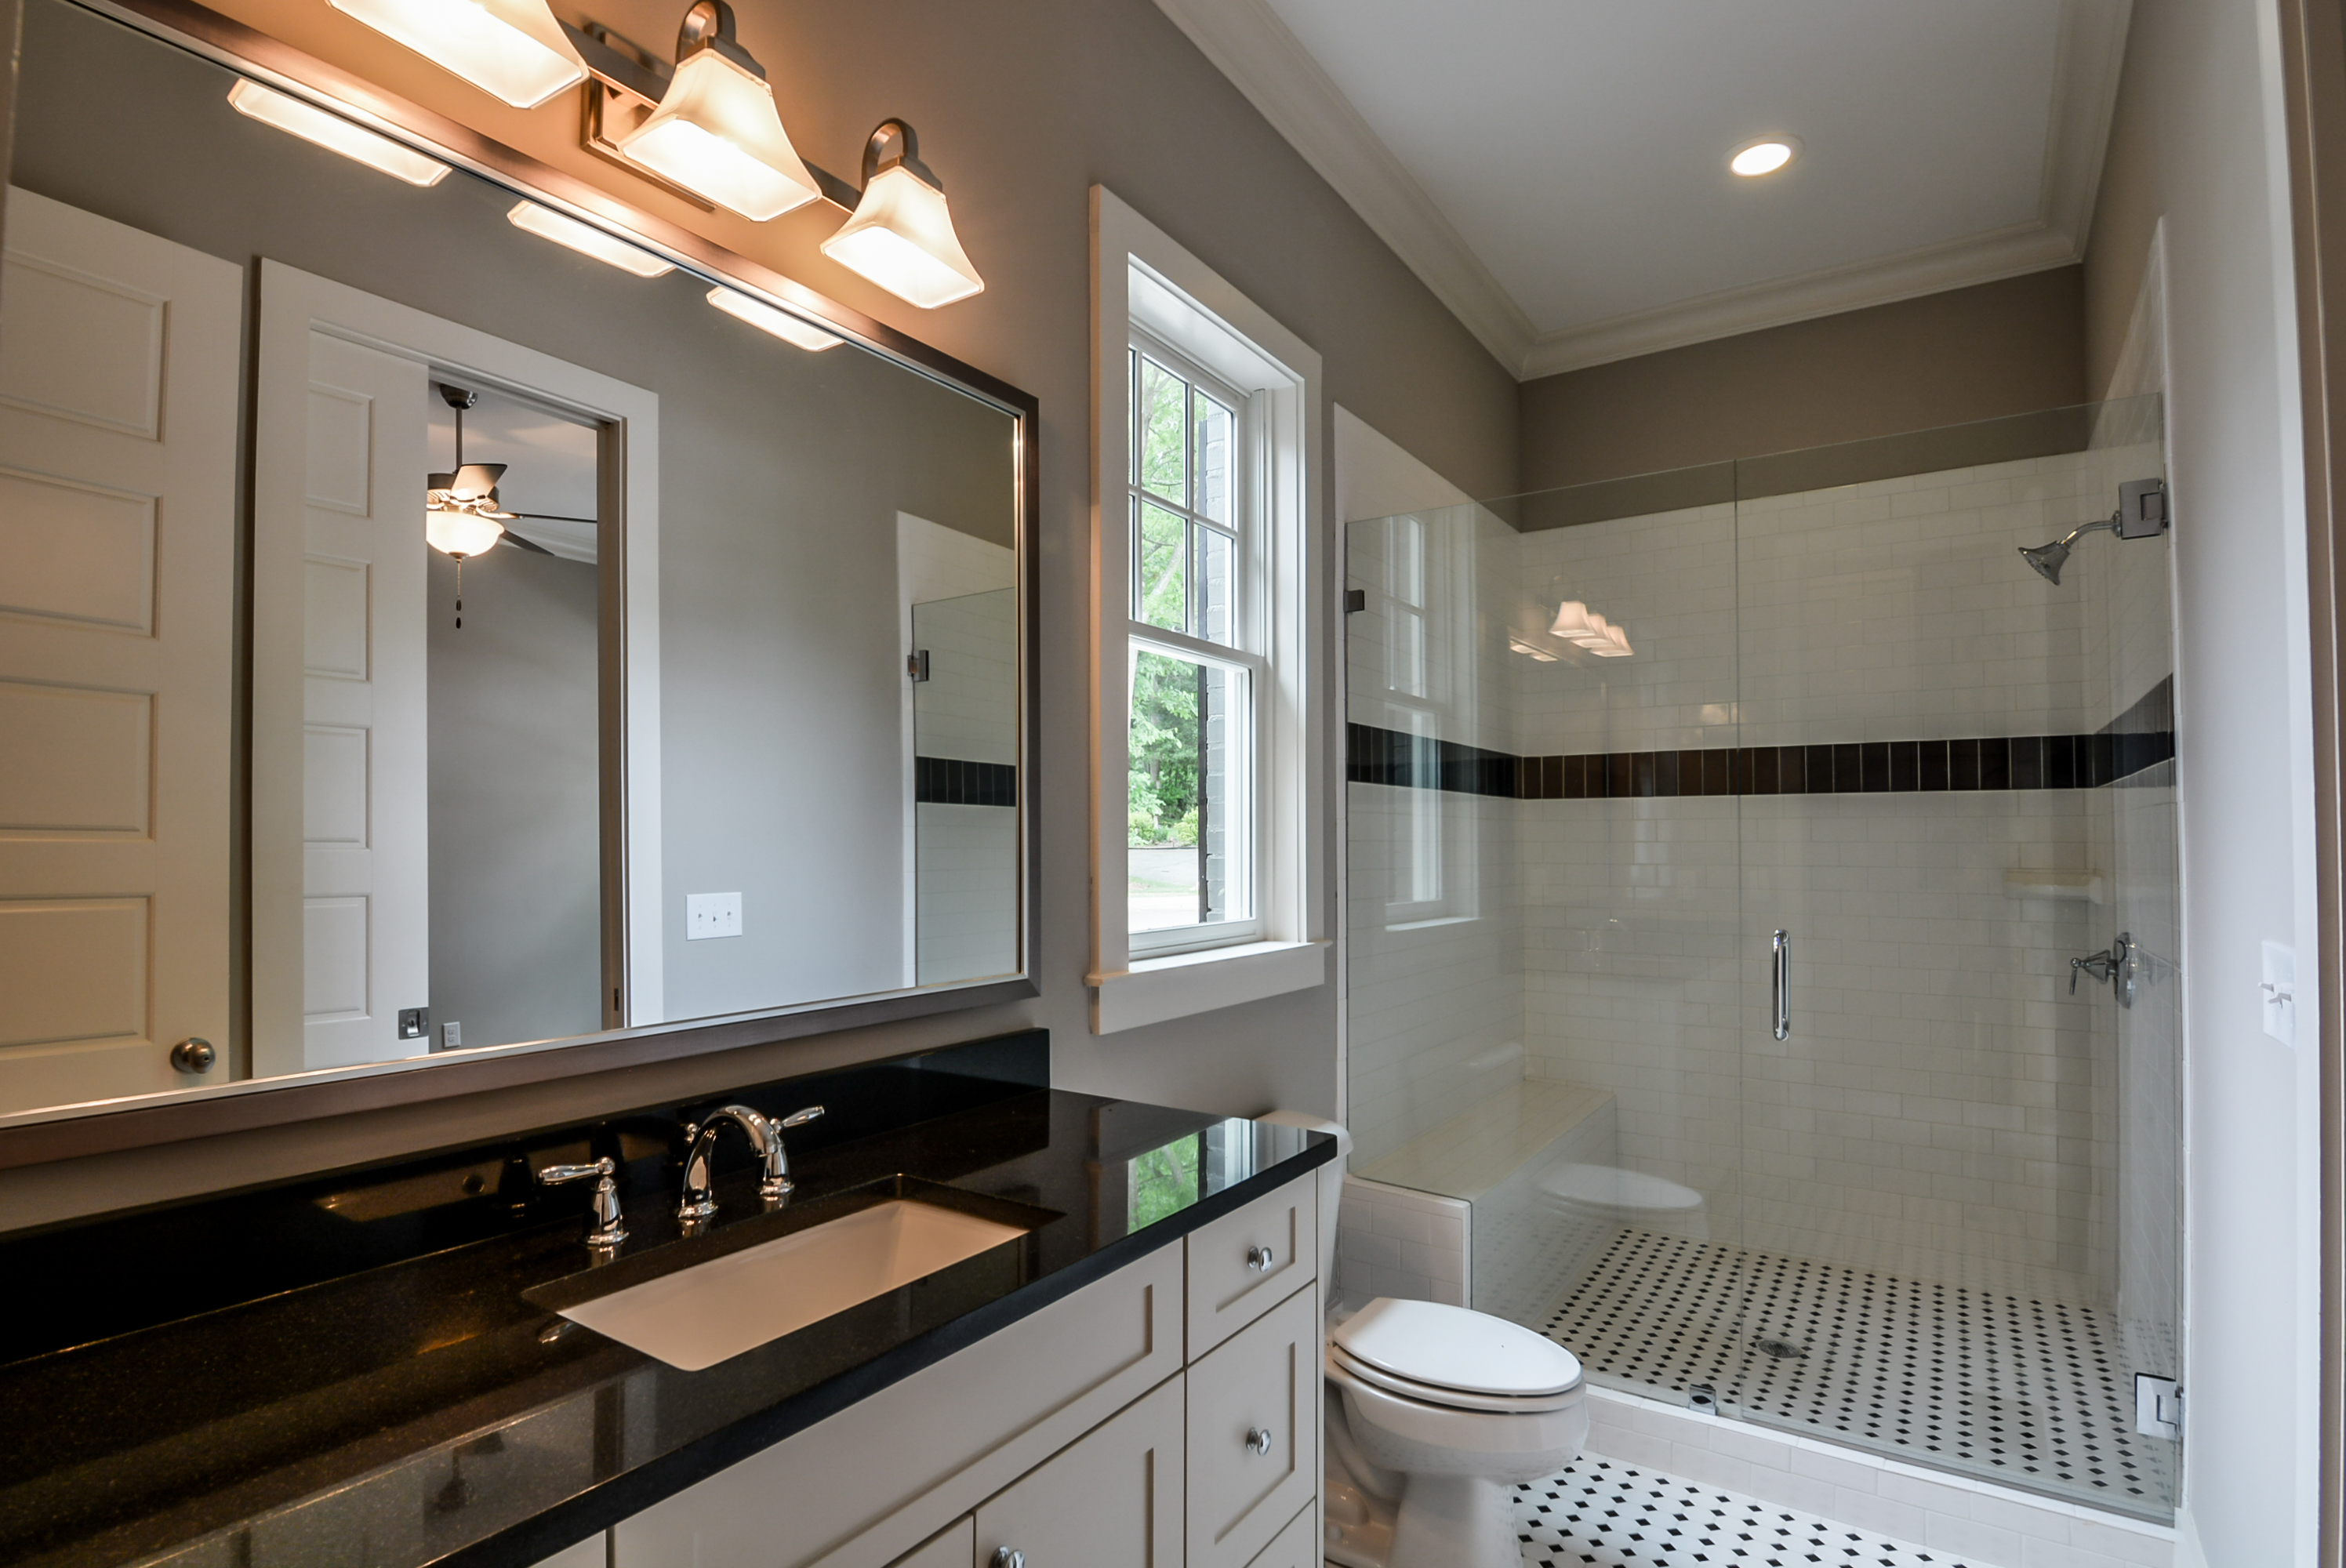 Black & White Retro Bathroom